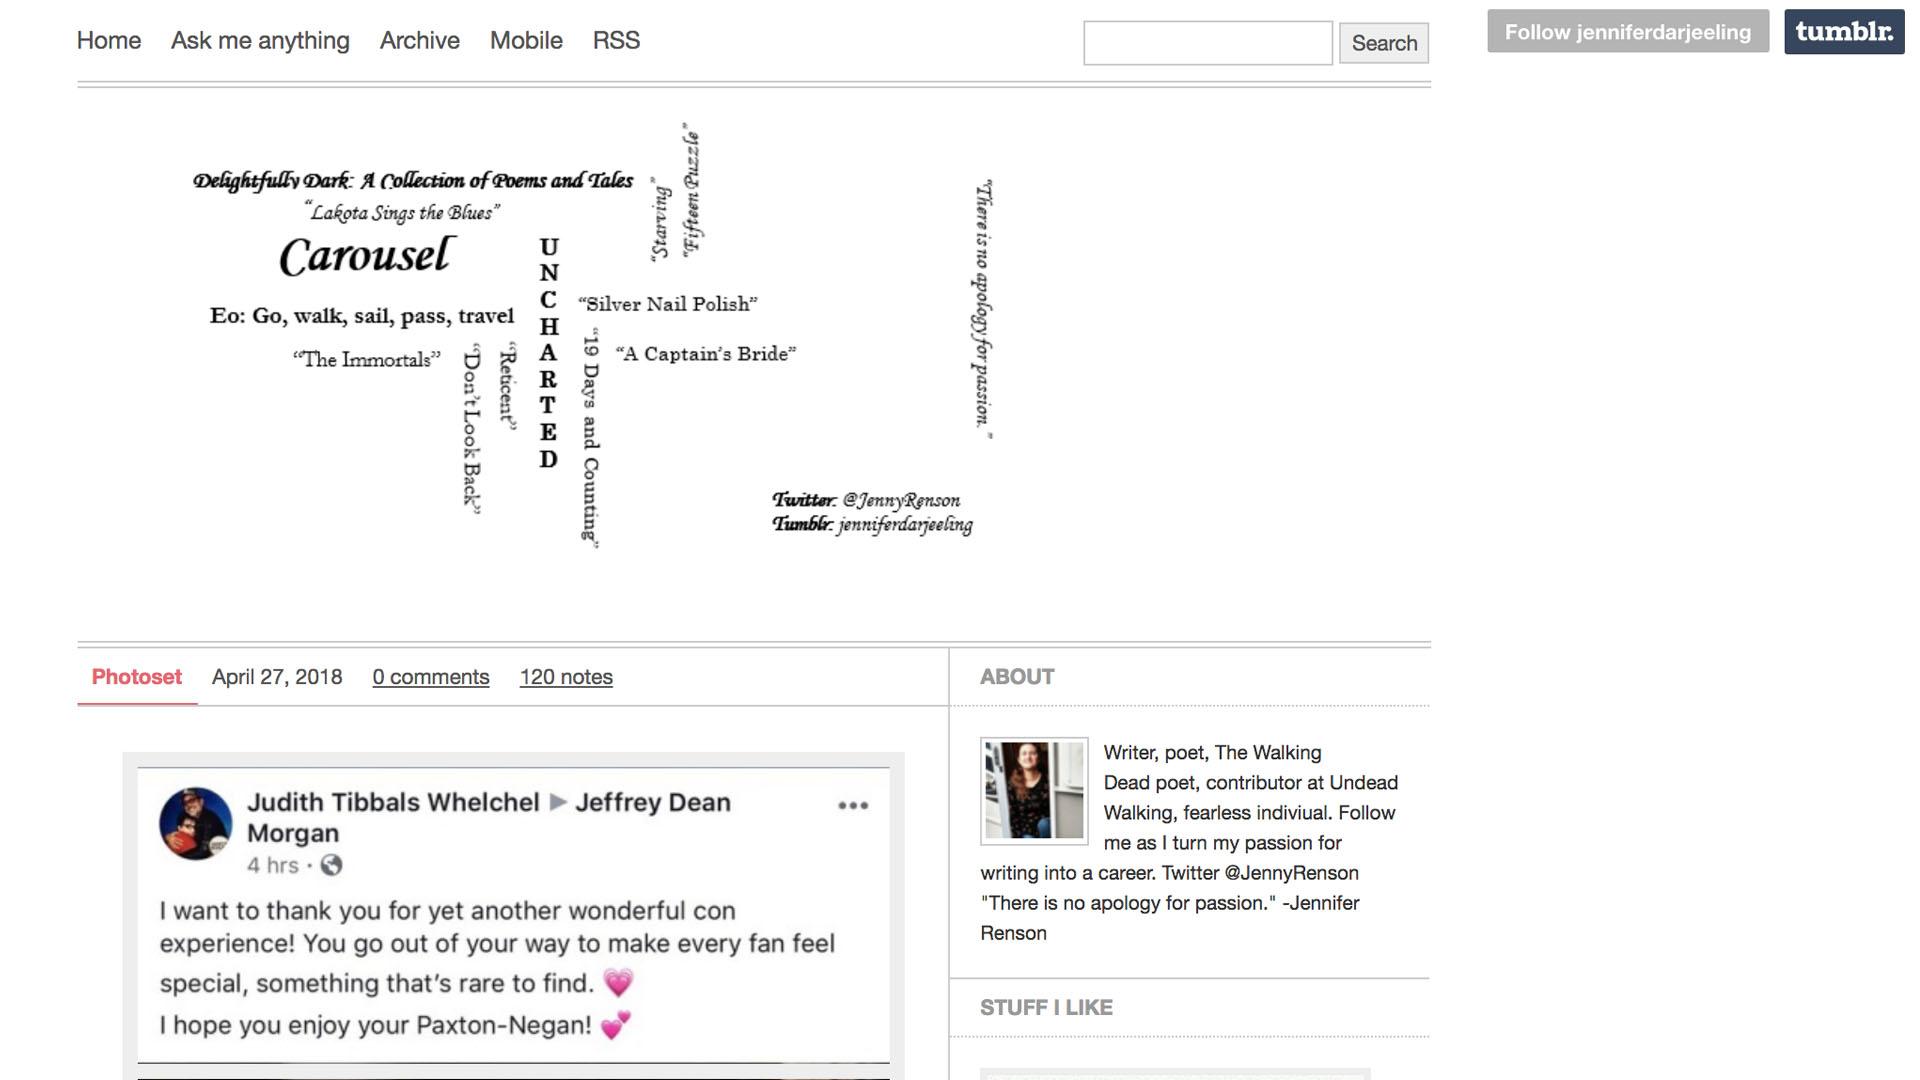 jenniferdarjeeling.tumblr.com